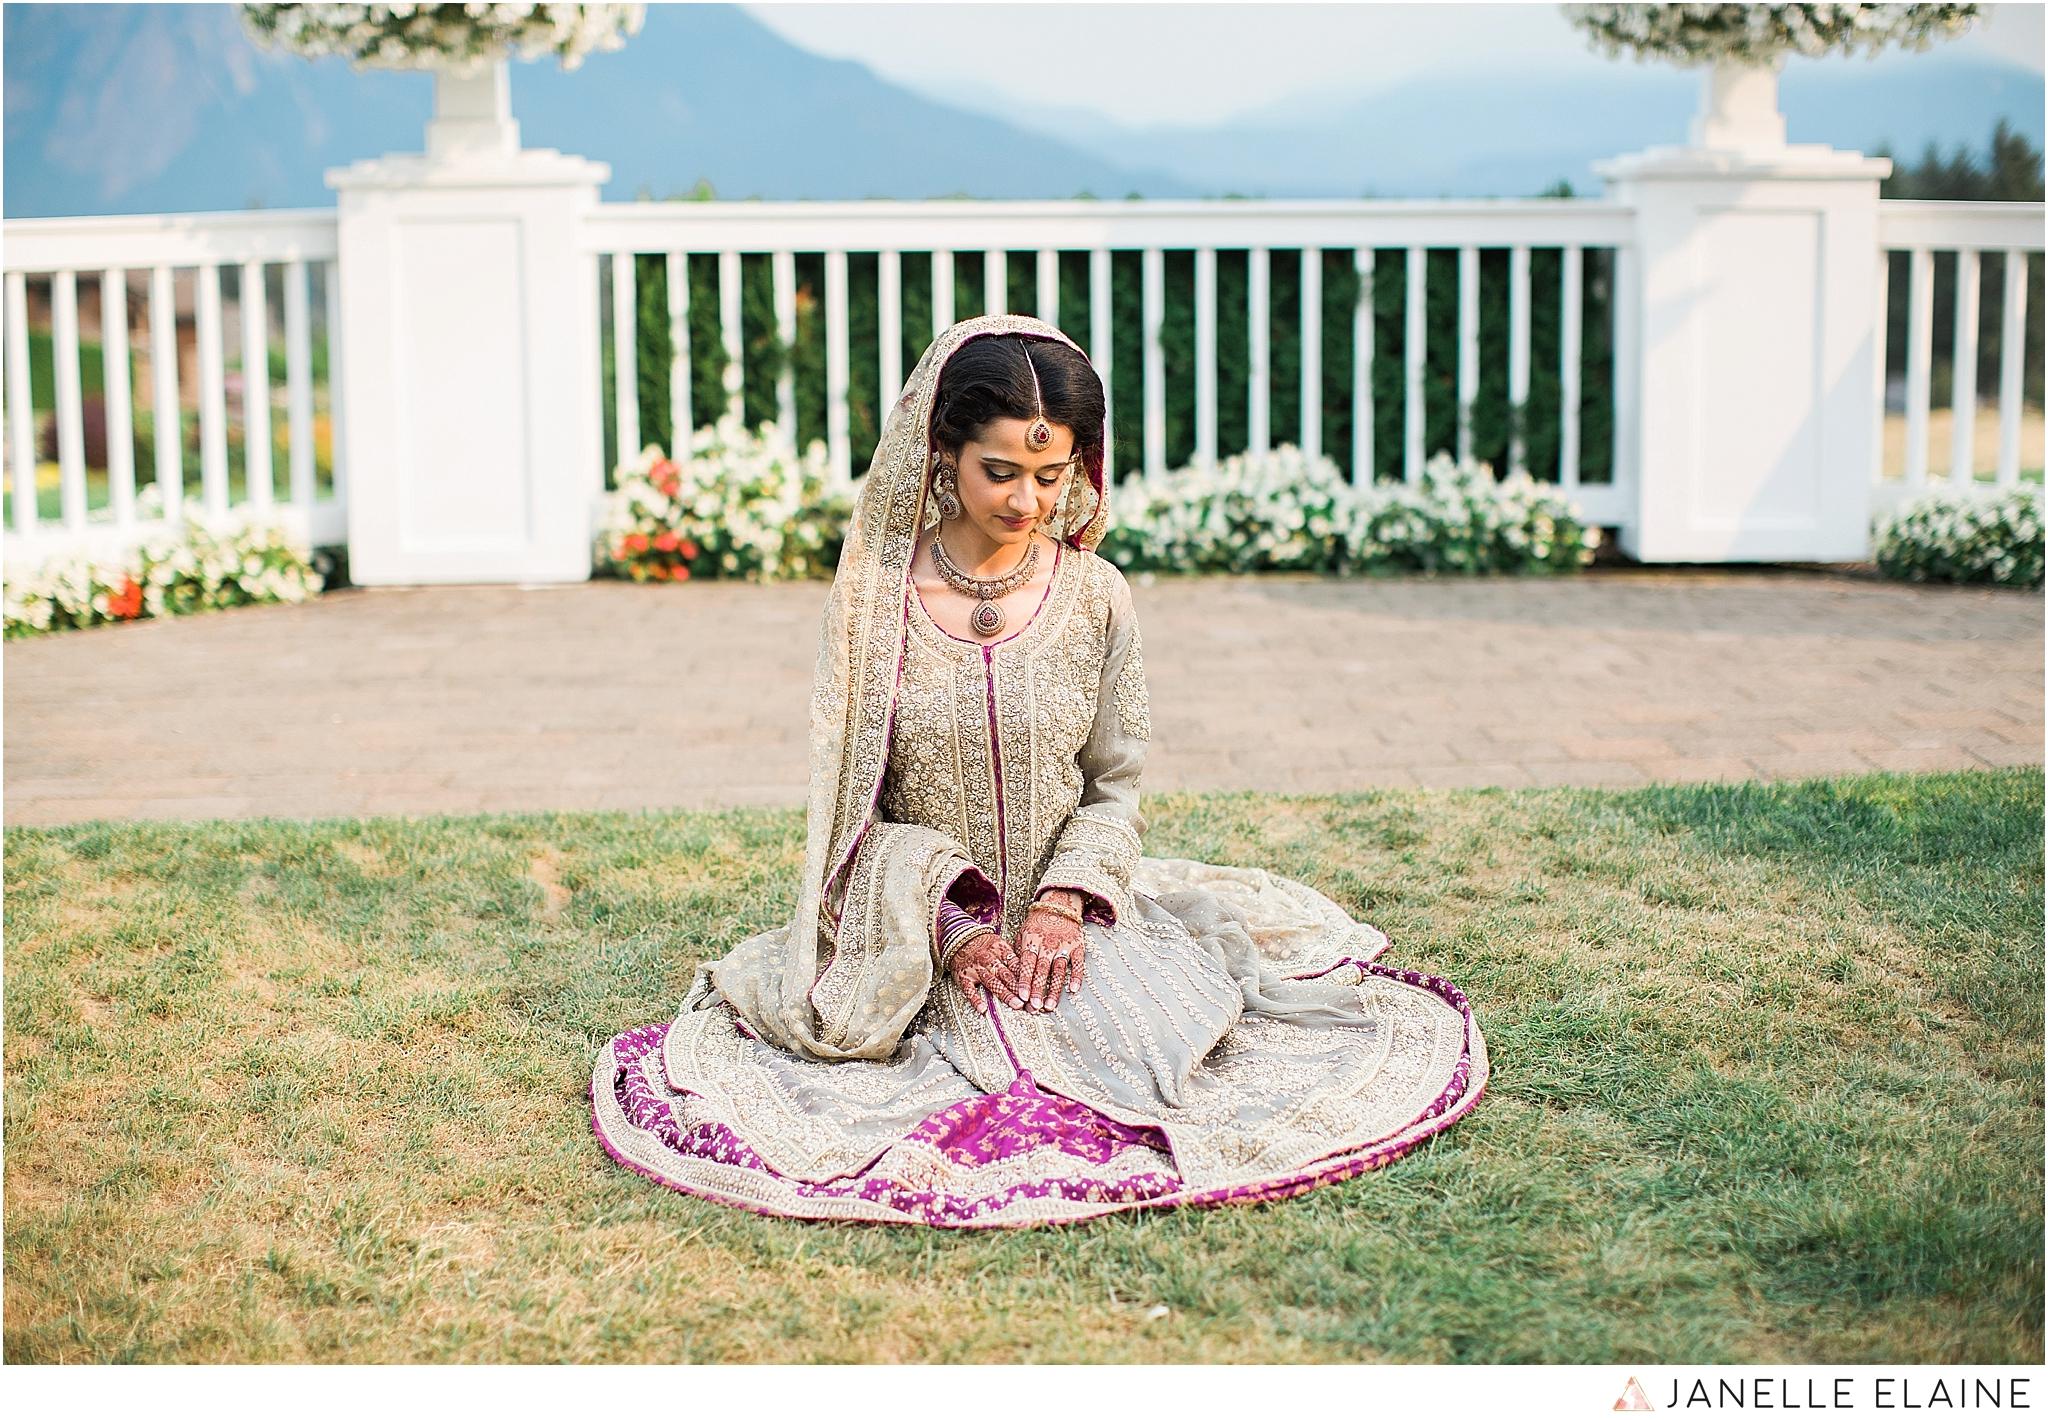 janelle elaine photography-the club at snoqualmie ridge-washington-wedding-photography-portraits-113.jpg